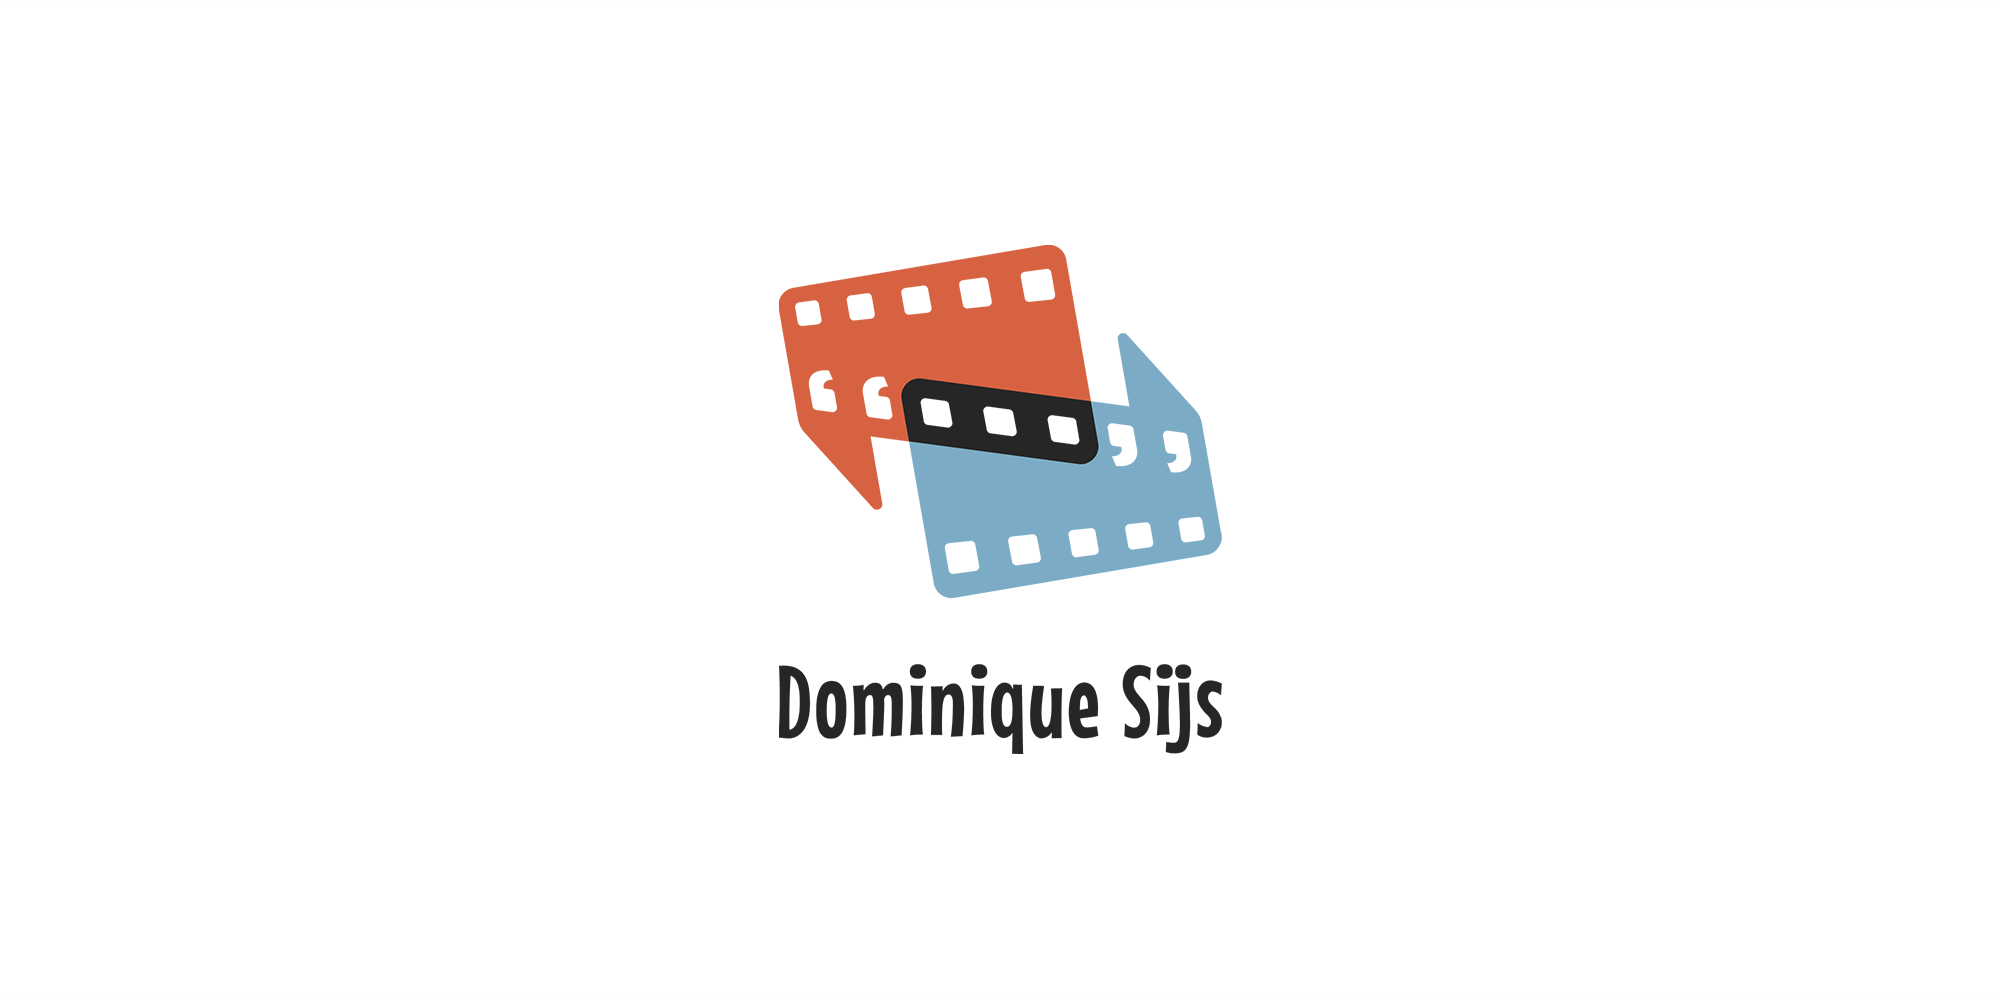 Dominique Sijs logo